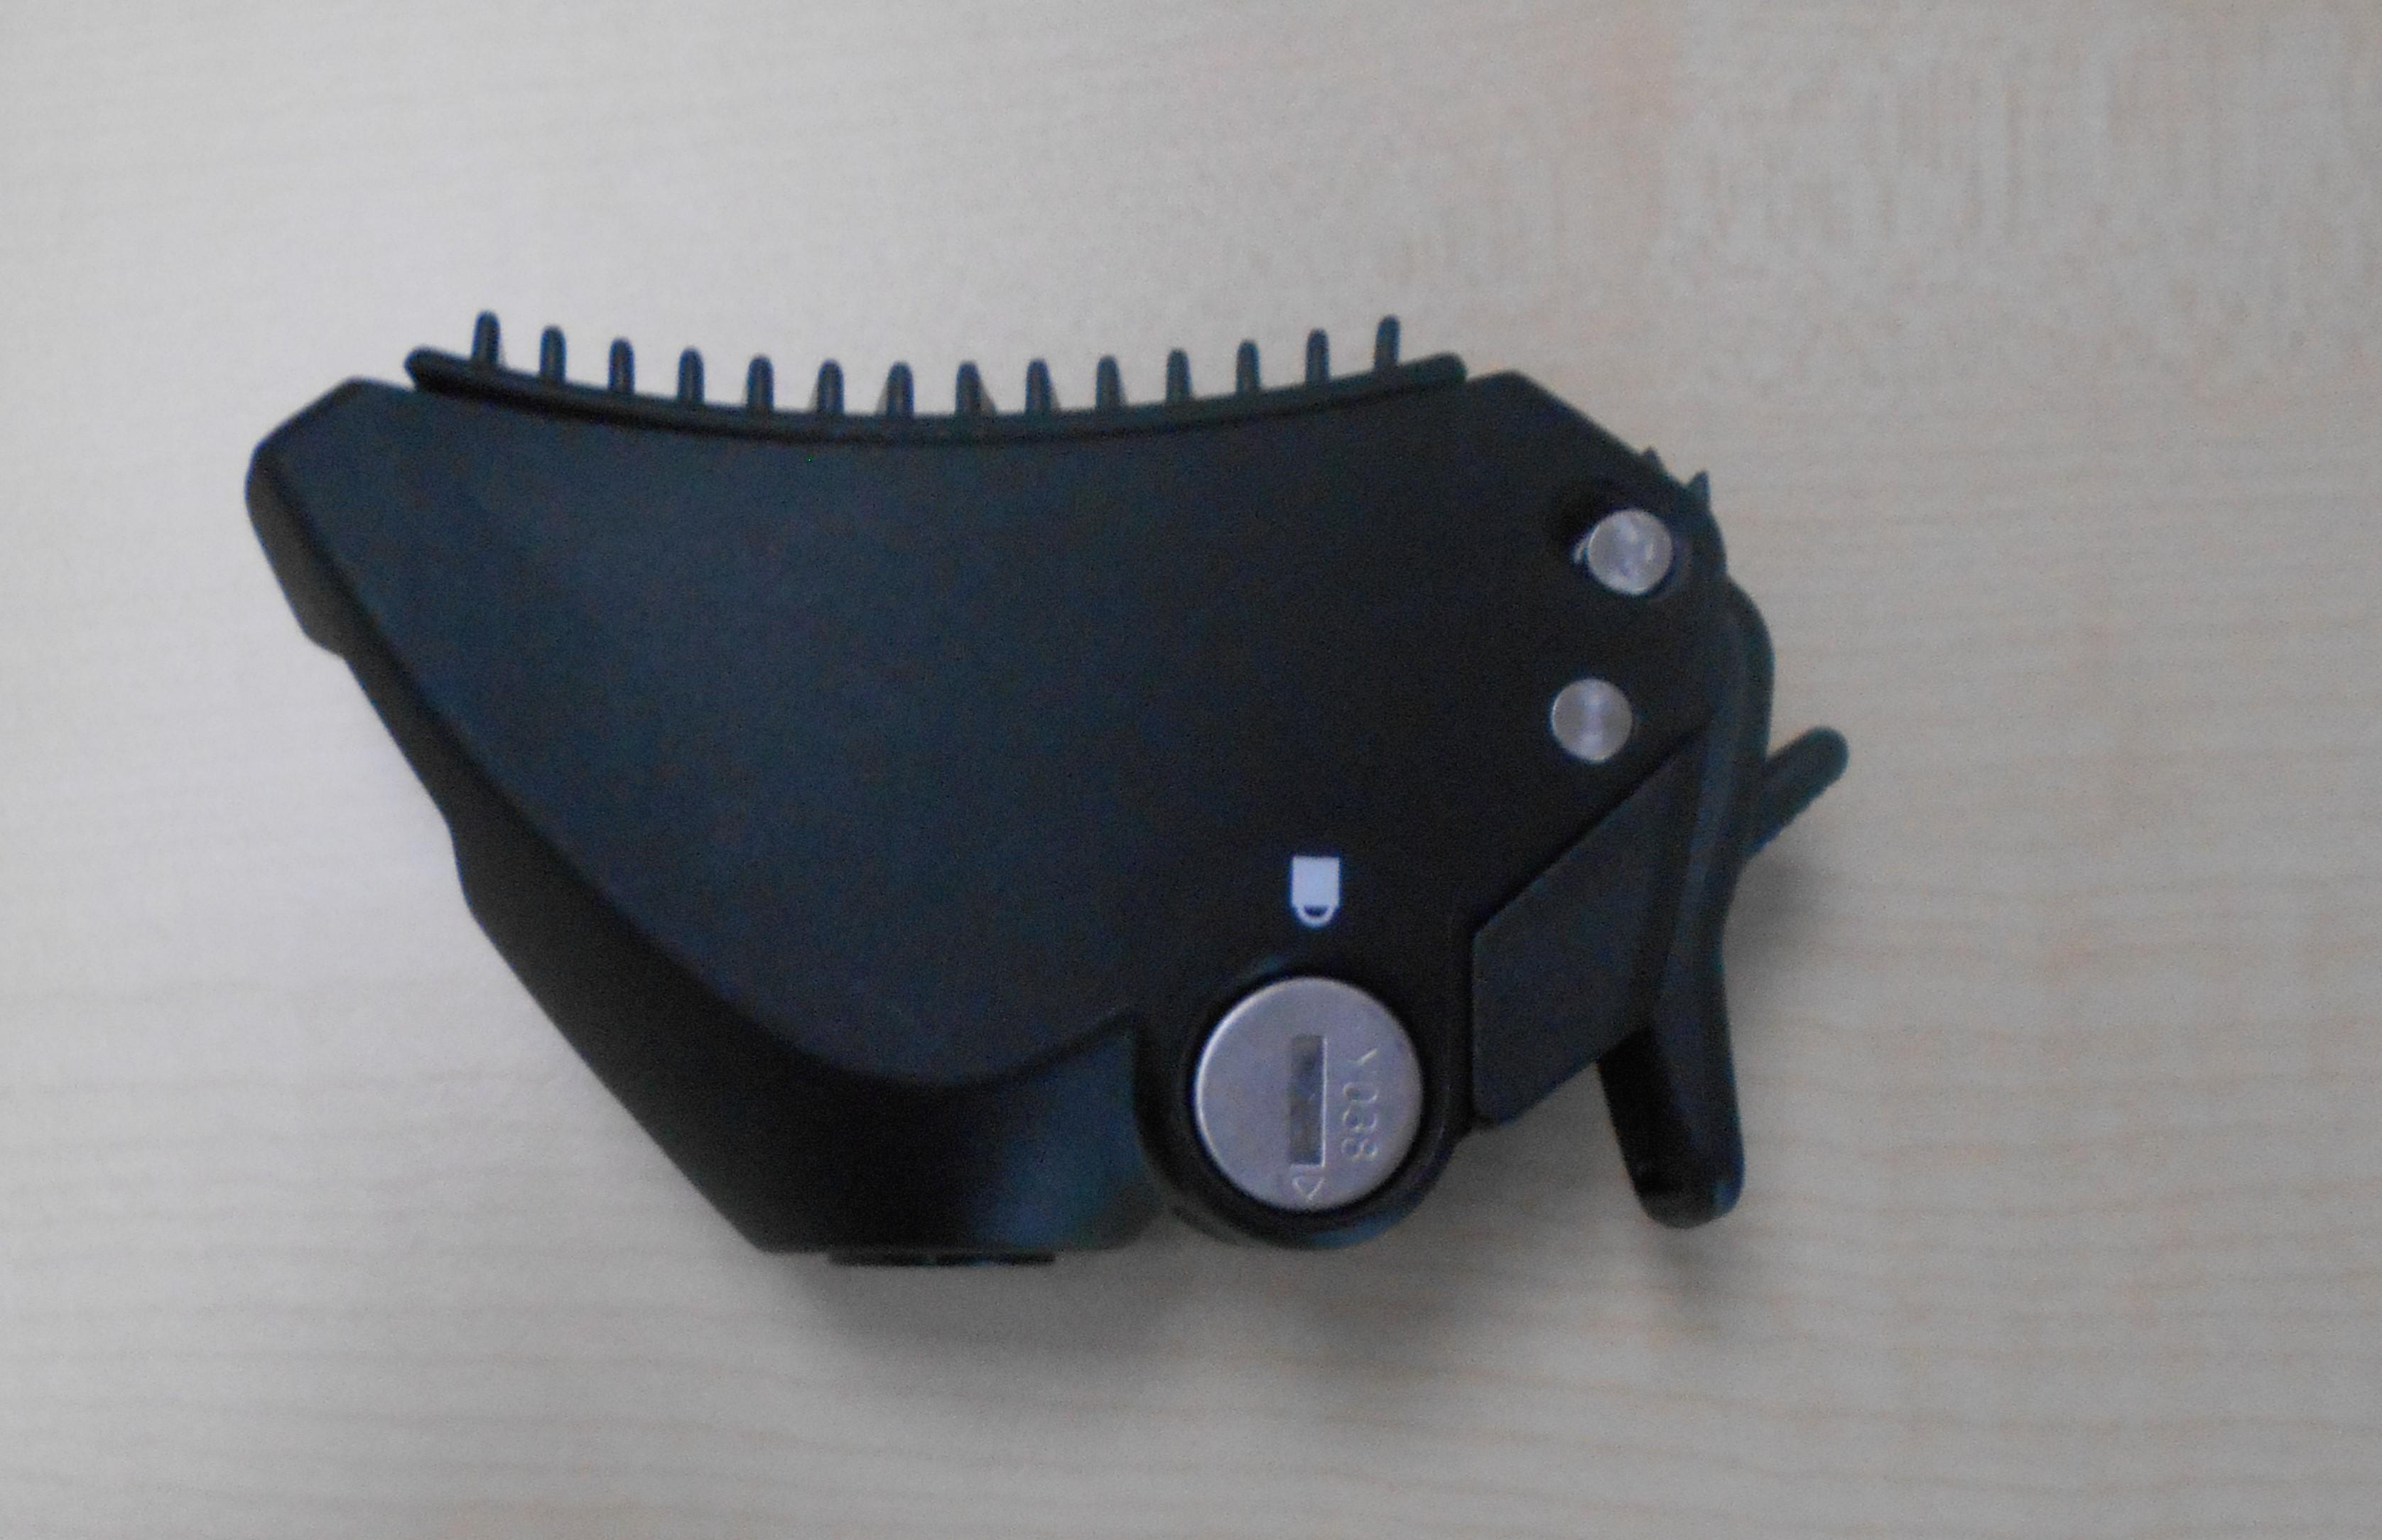 Kopf E-Bike Rahmenhalter mit Schlosscode Y016